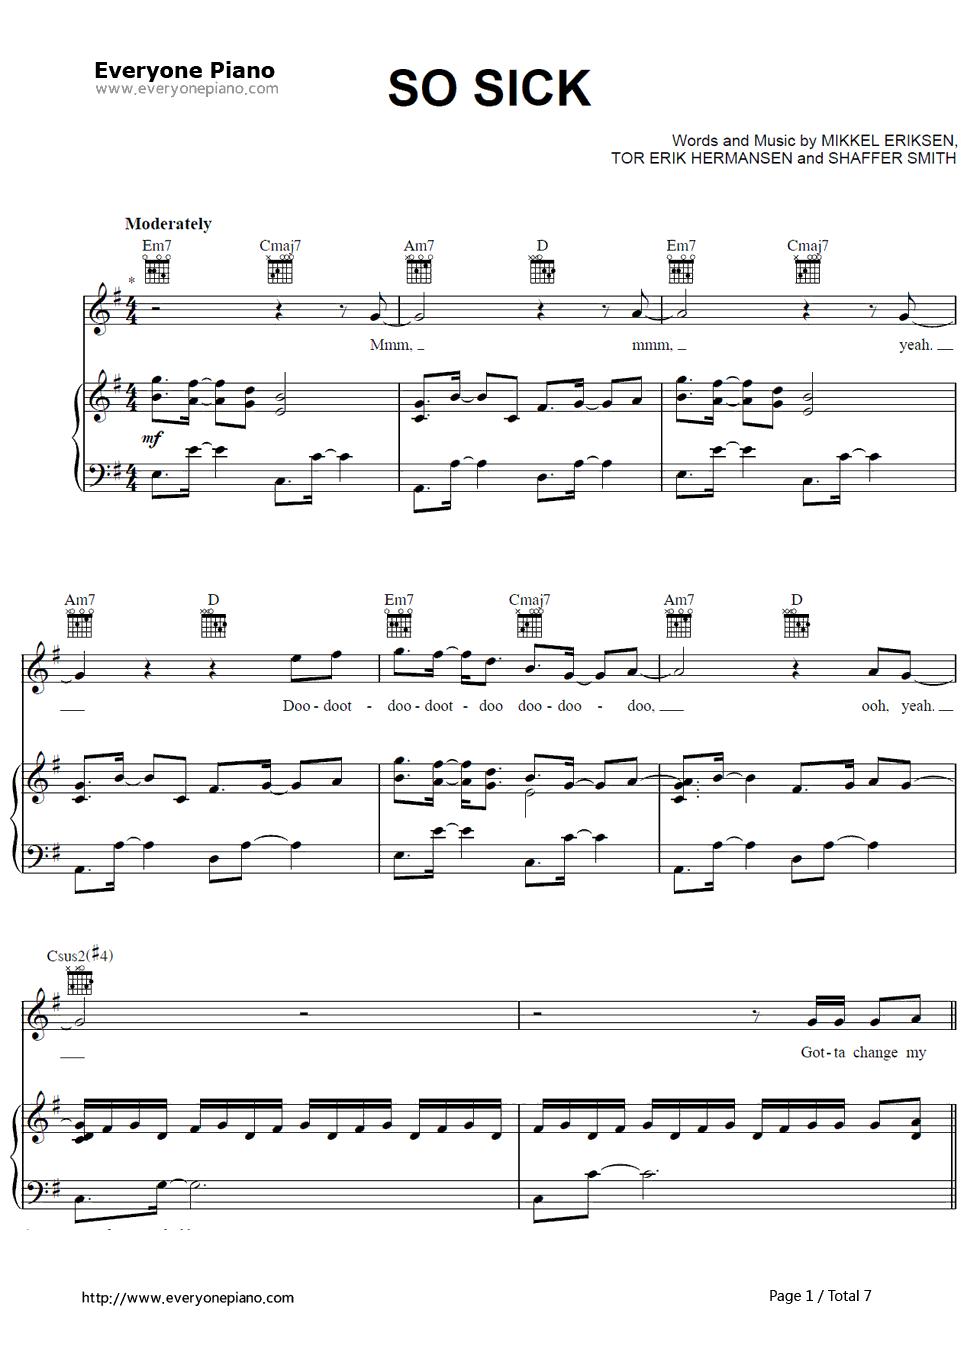 So sick ne yo stave preview 1 free piano sheet music piano chords listen now print sheet so sick ne yo stave preview 1 hexwebz Image collections